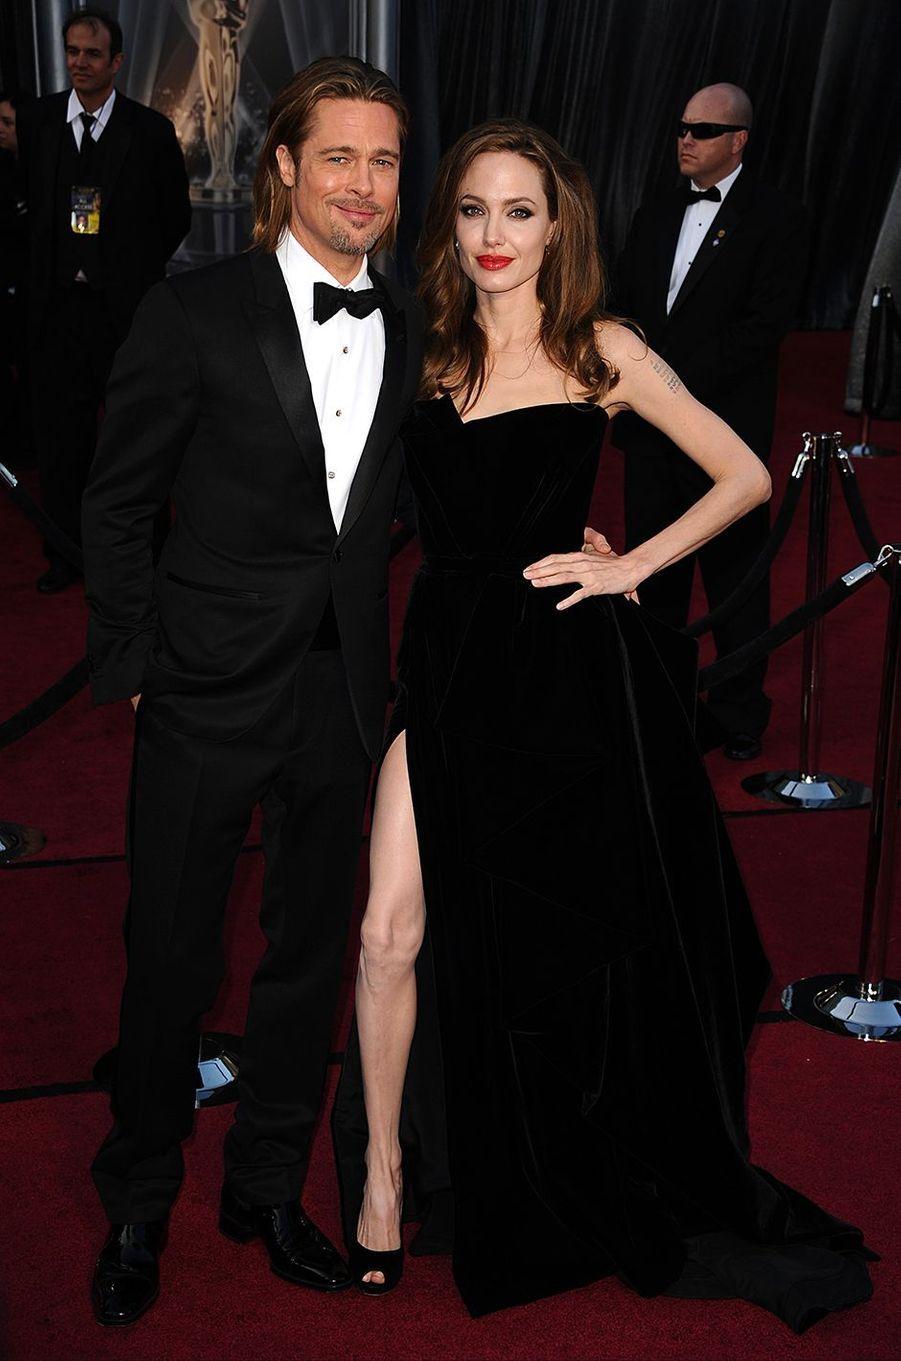 Angie avec son époux Brad Pitt en 2012